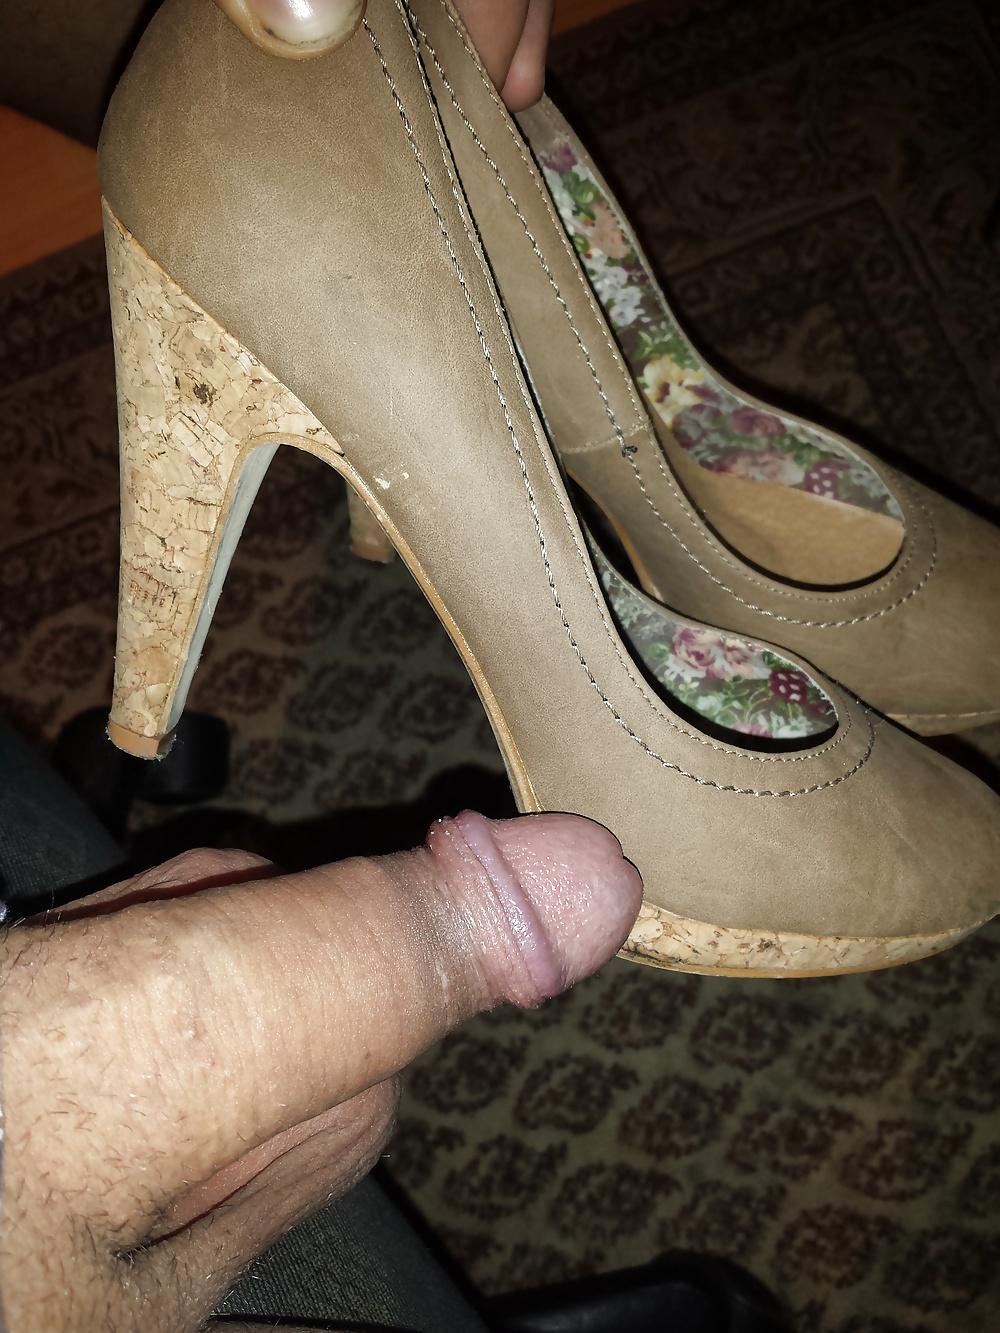 дрочат женскими туфлями - 1